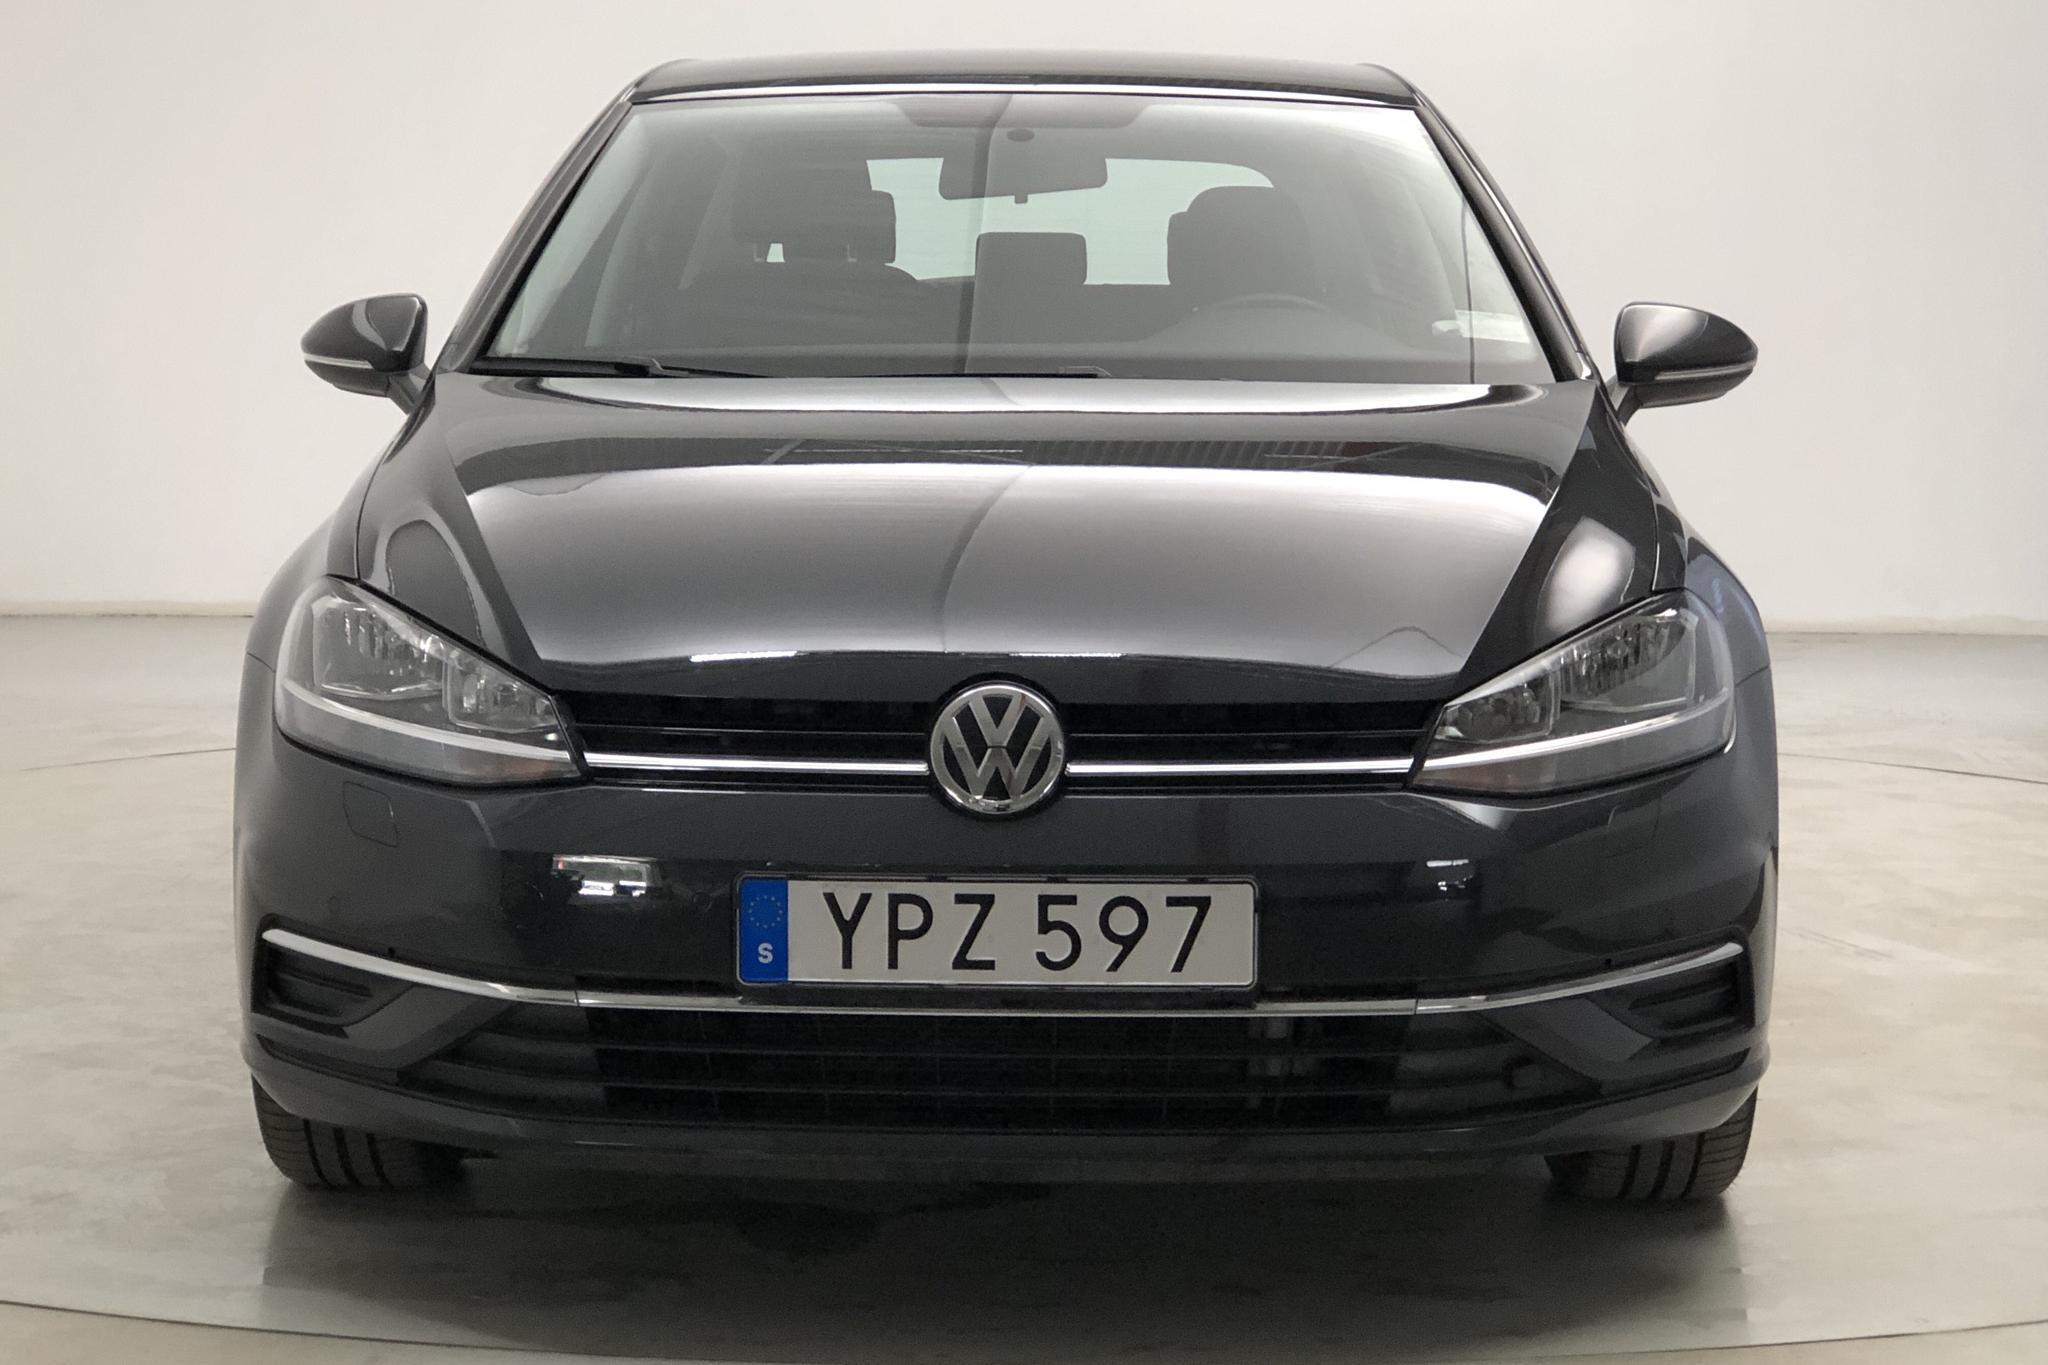 VW Golf VII 1.4 TSI Multifuel 5dr (125hk) - 27 560 km - Manual - Dark Grey - 2018